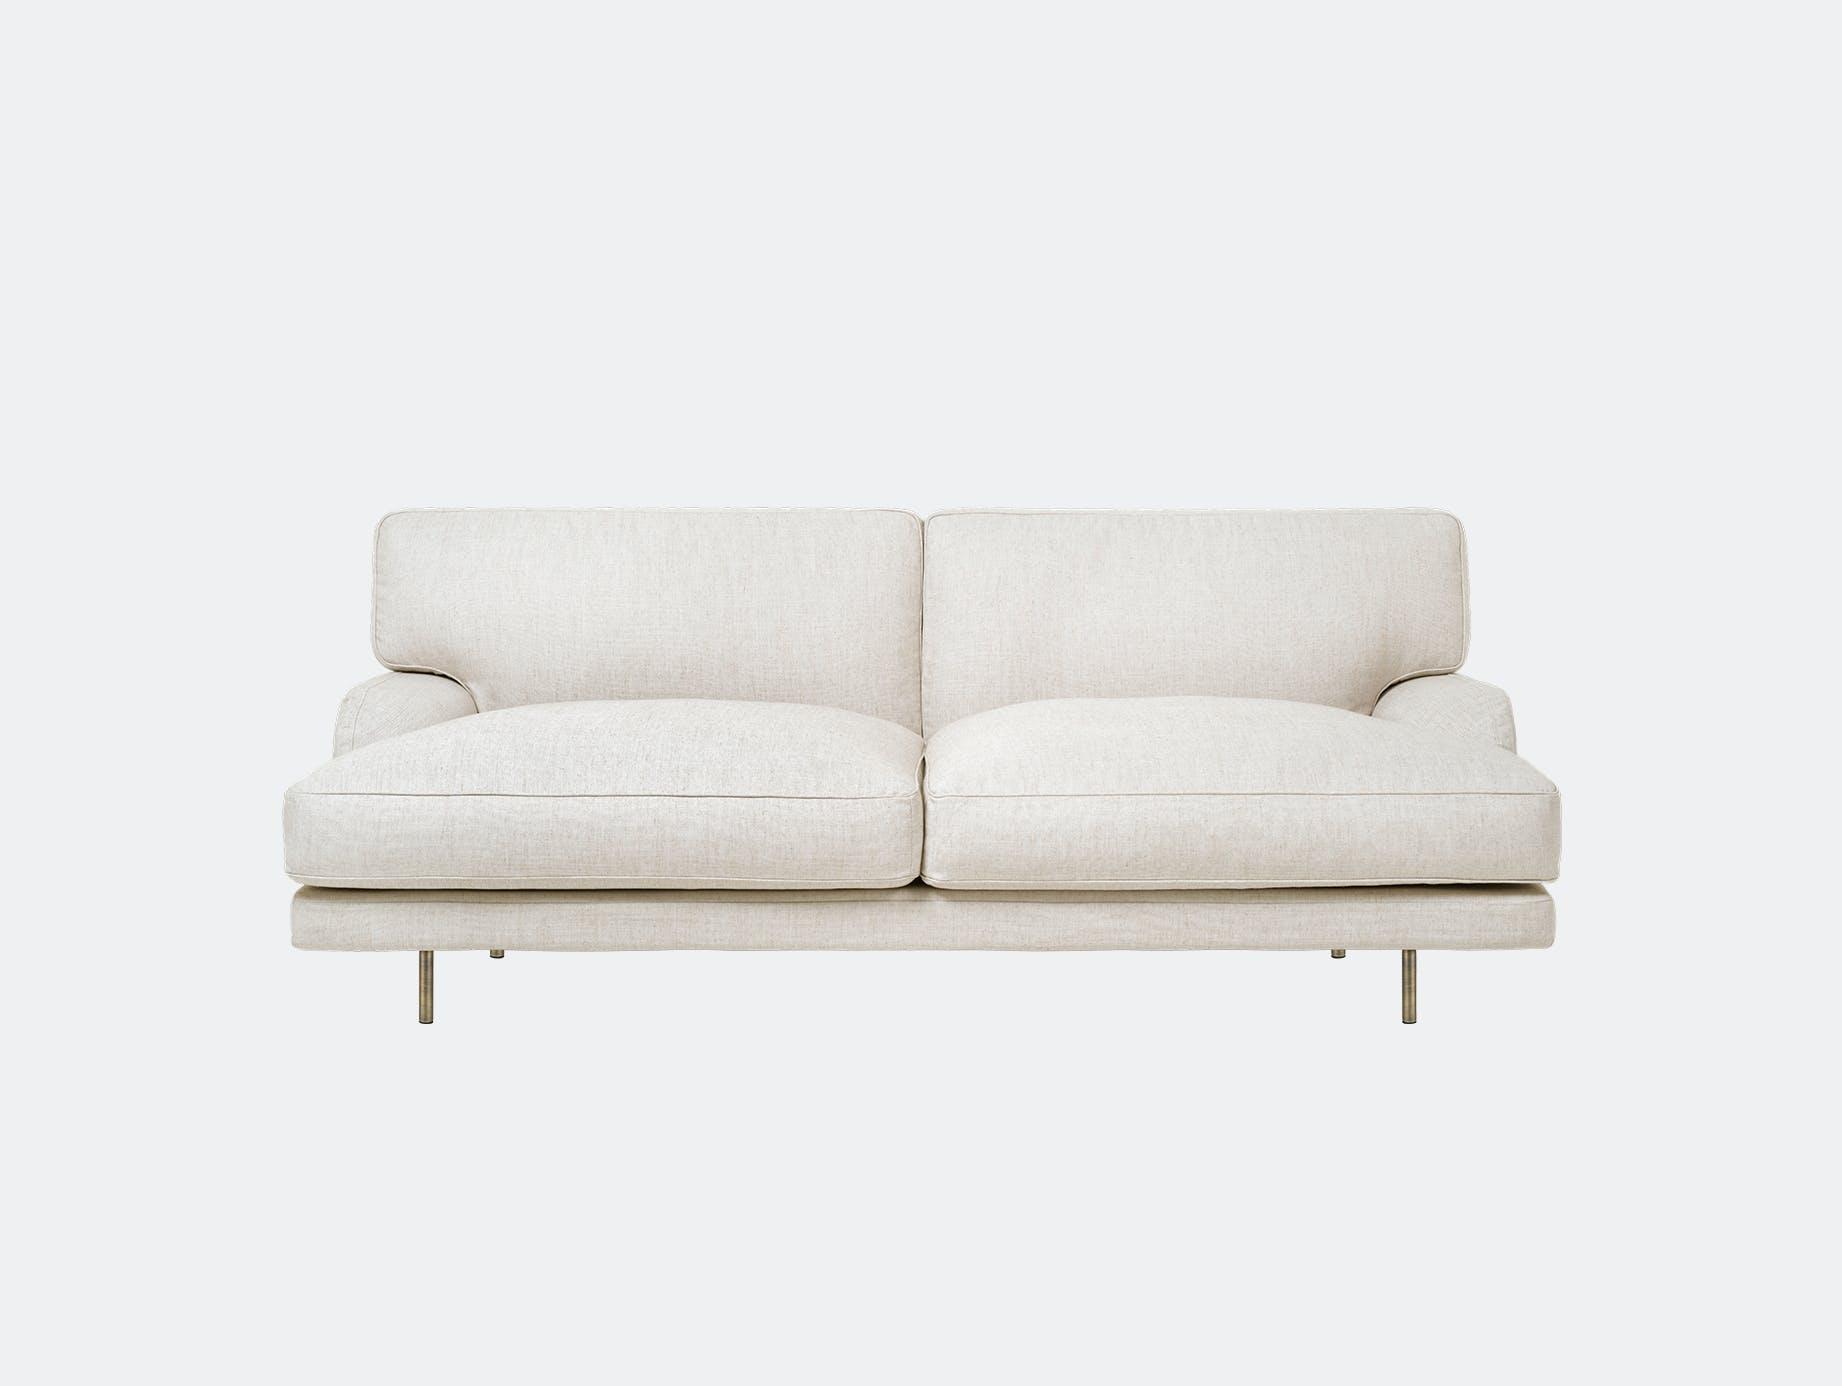 Gubi flaneur 2 seat sofa chambray 24 brs